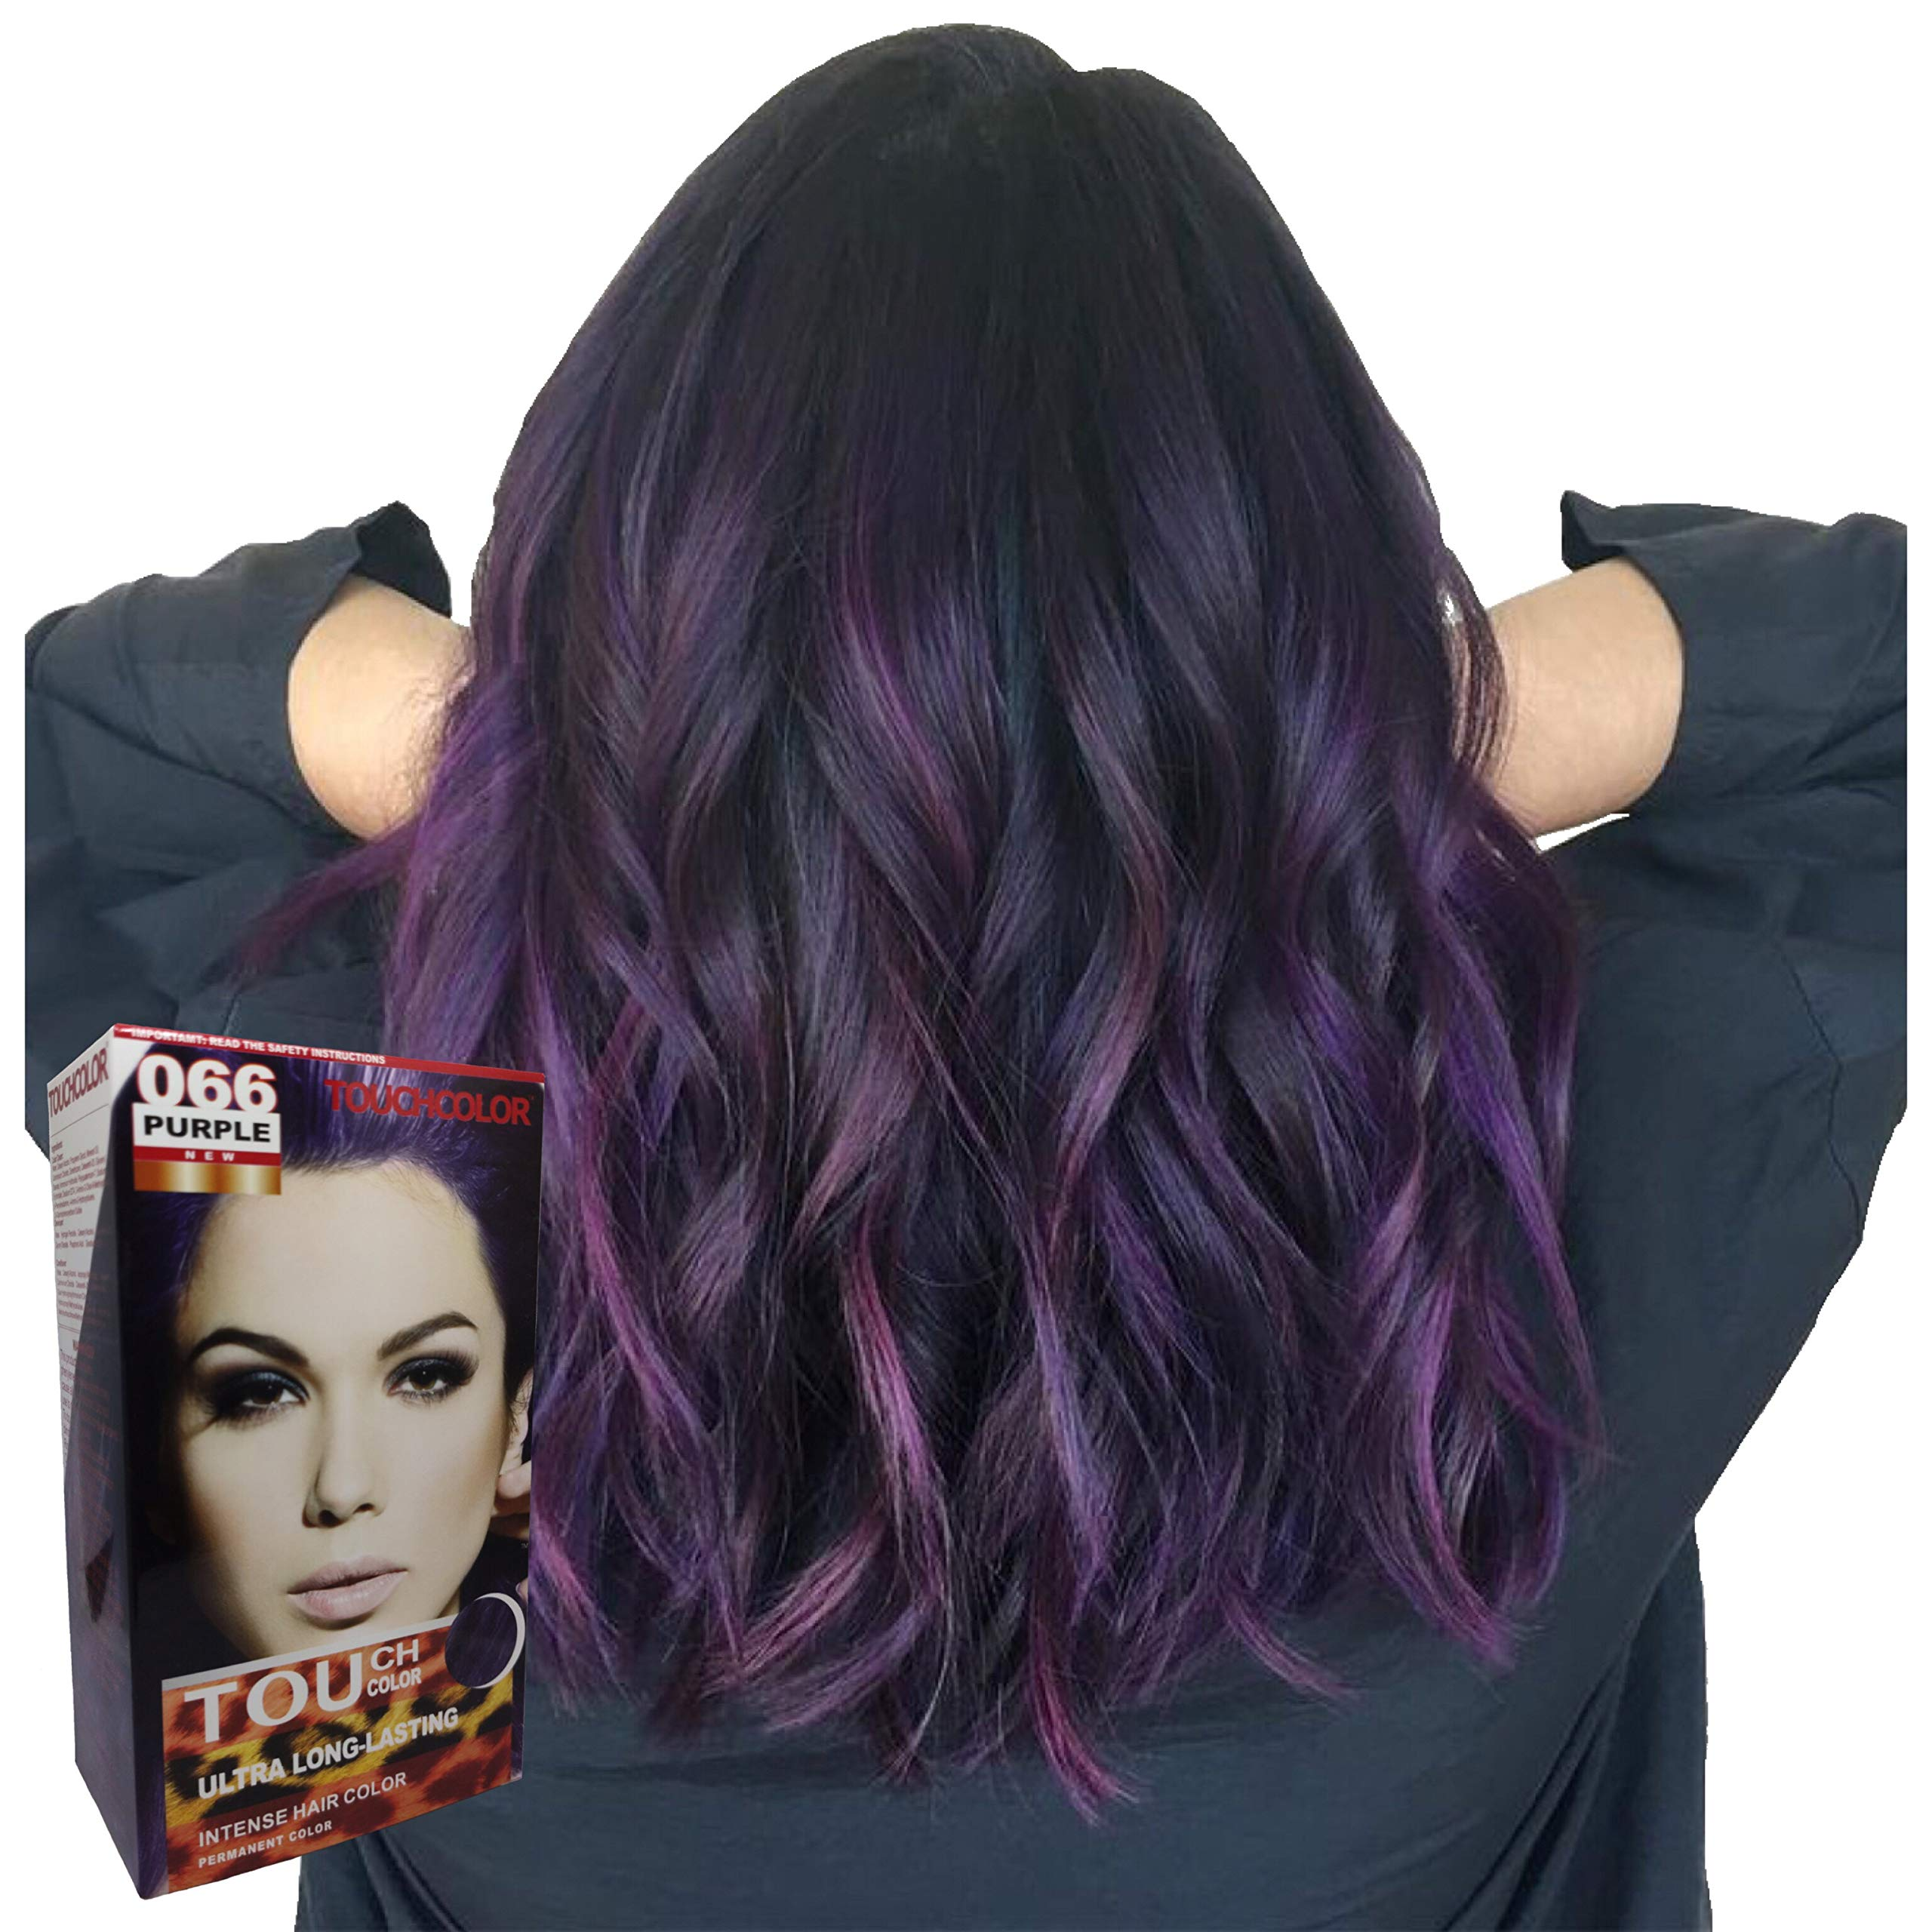 Touchcolor Hair Color Purple 80ml, Hair color cream, Permanent hair color, Hair dye, Highlights by Great Lengths